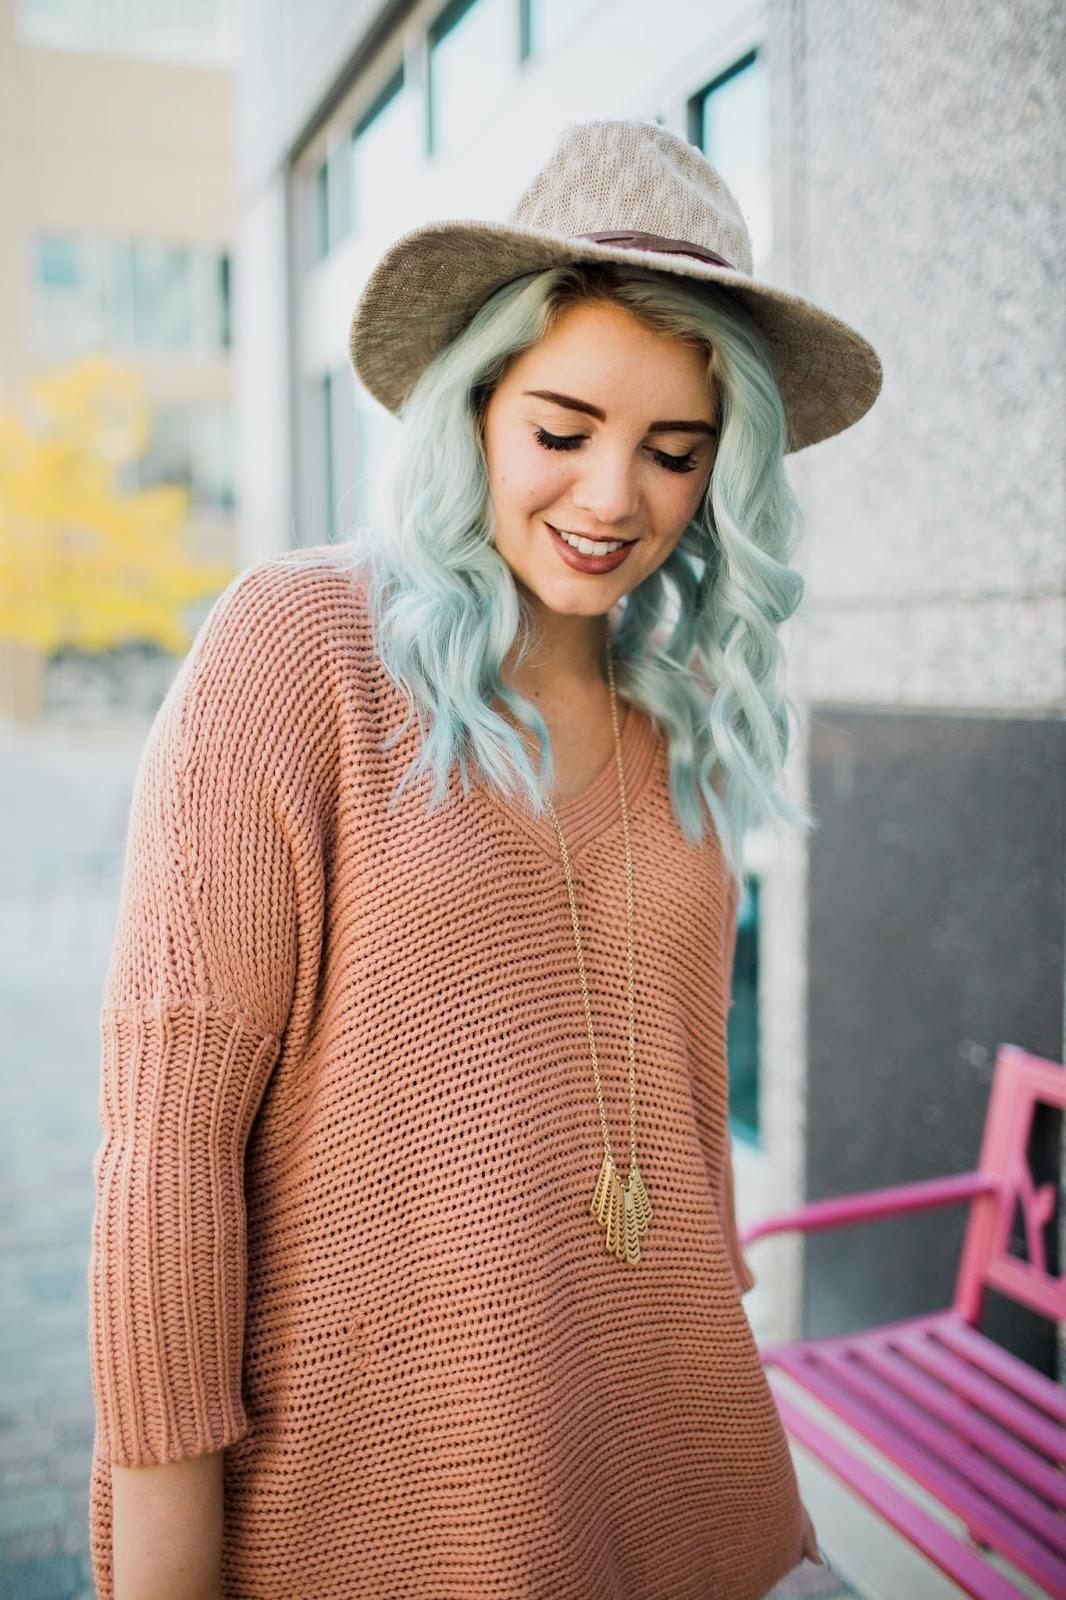 Blush Sweater, Utah Fashion Blogger, LipSense